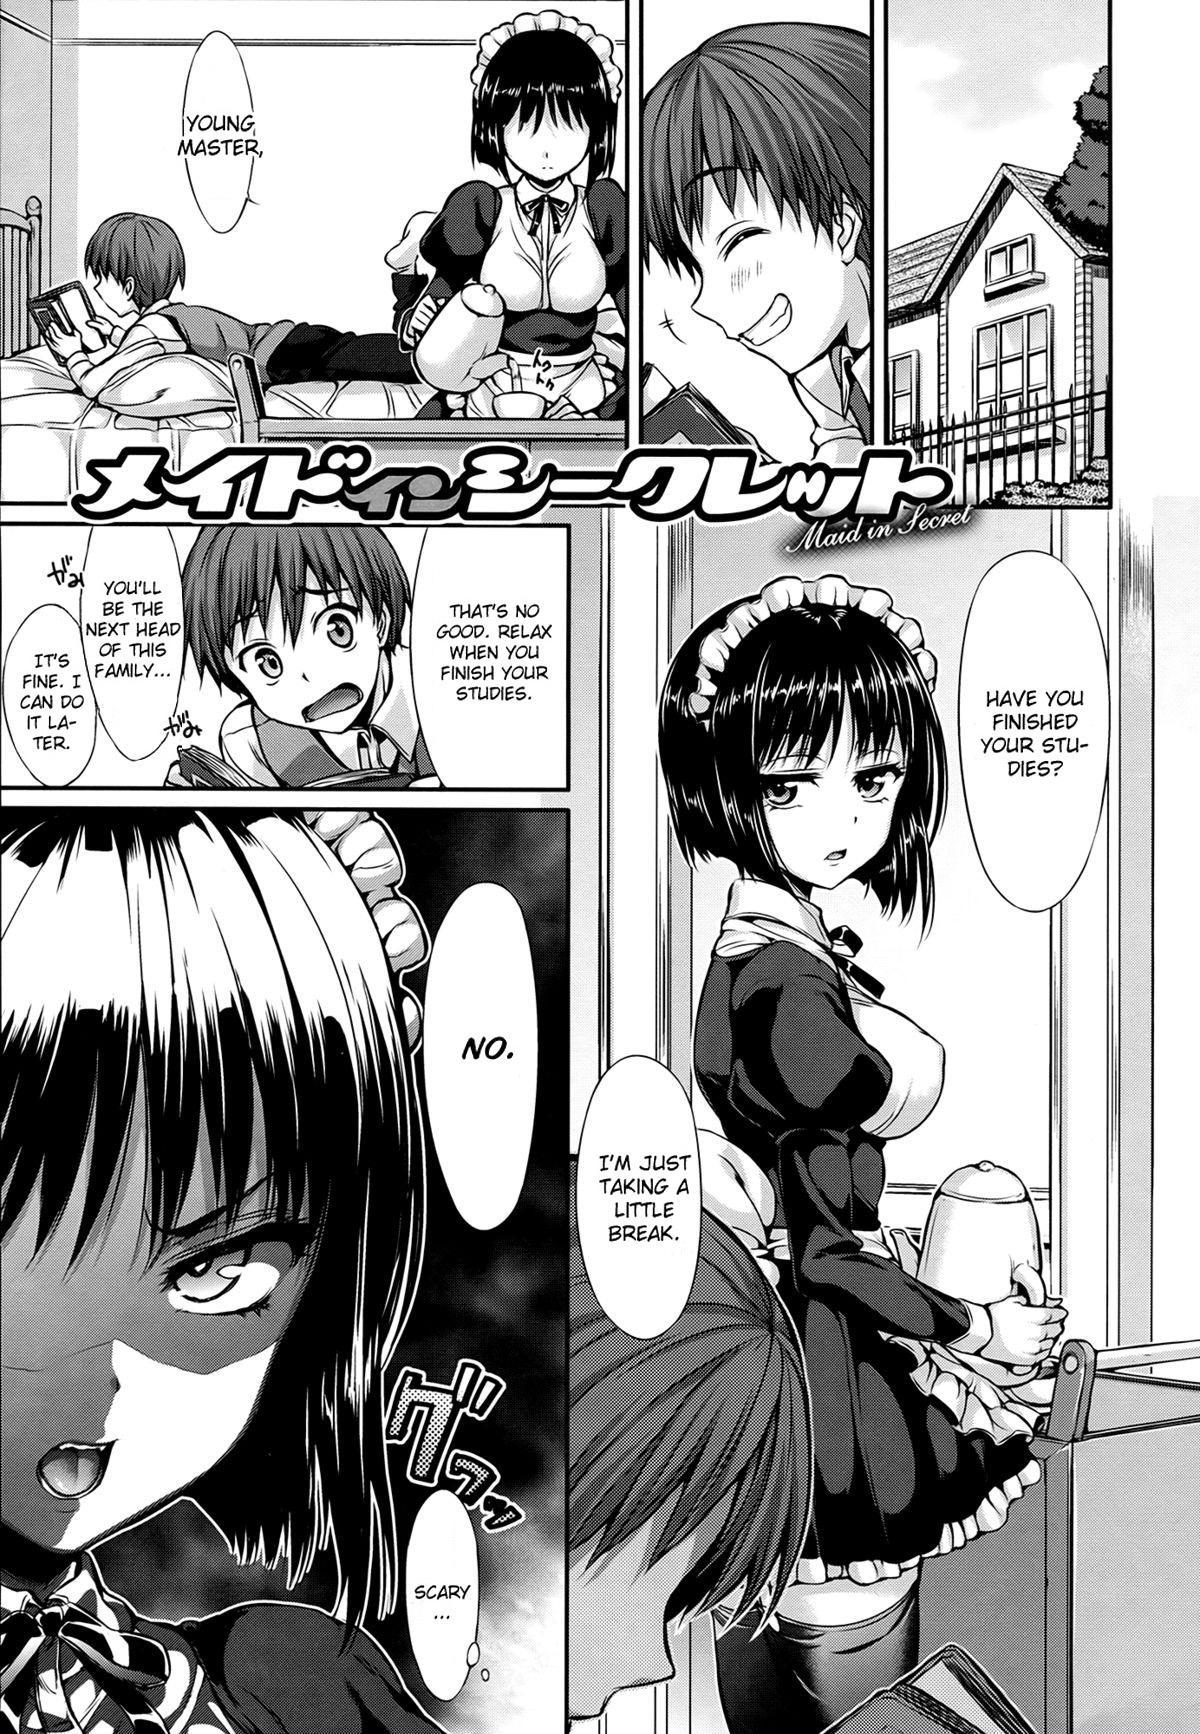 [Hisasi] Shoujo no Toge ~No girl without a thorn~ [English][Digital] + 8P Shousasshi 121